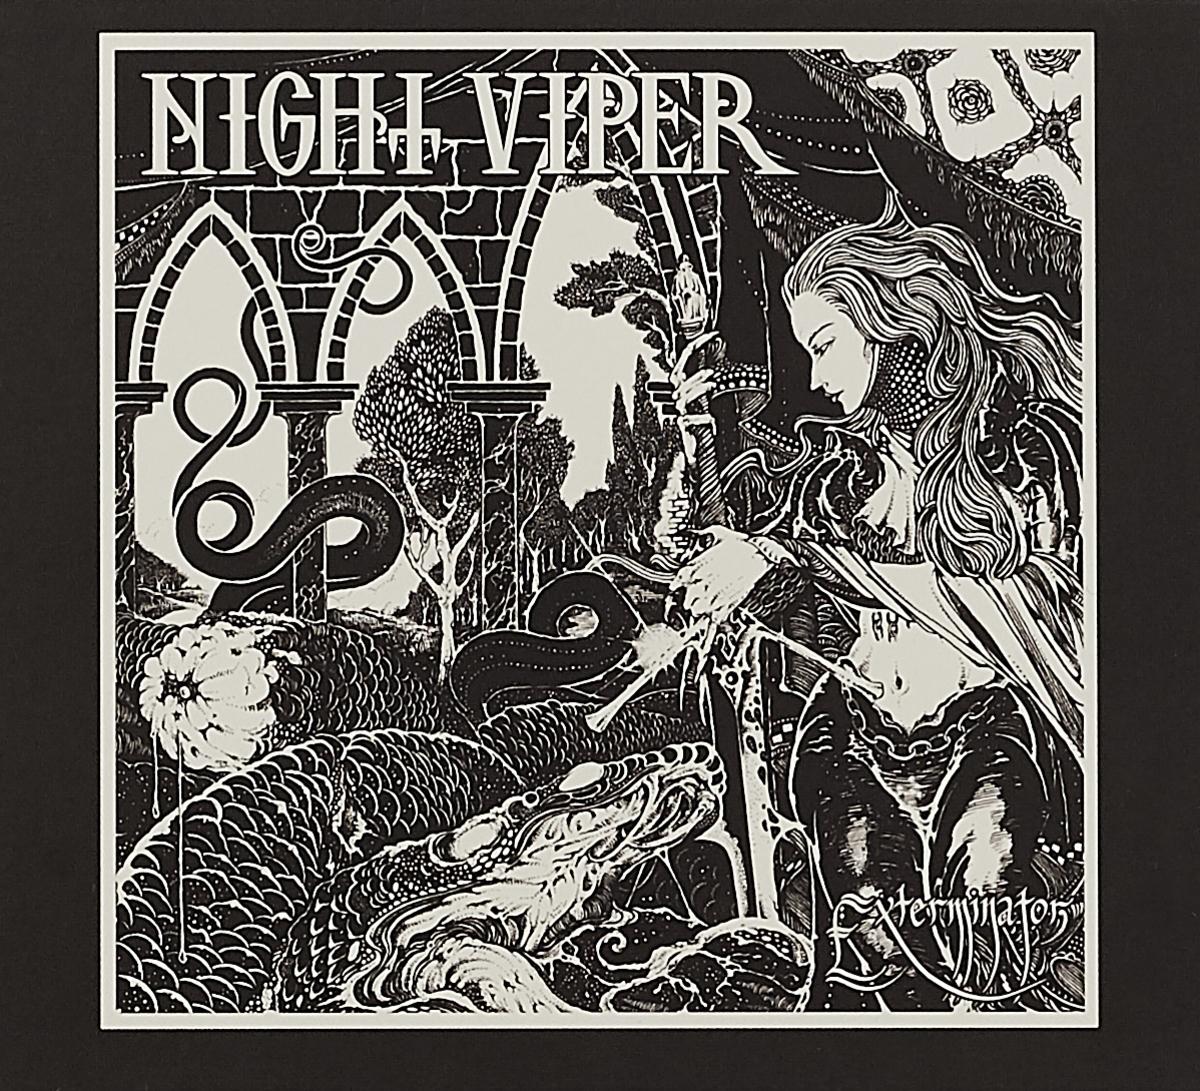 Night Viper Night Viper. Exterminator